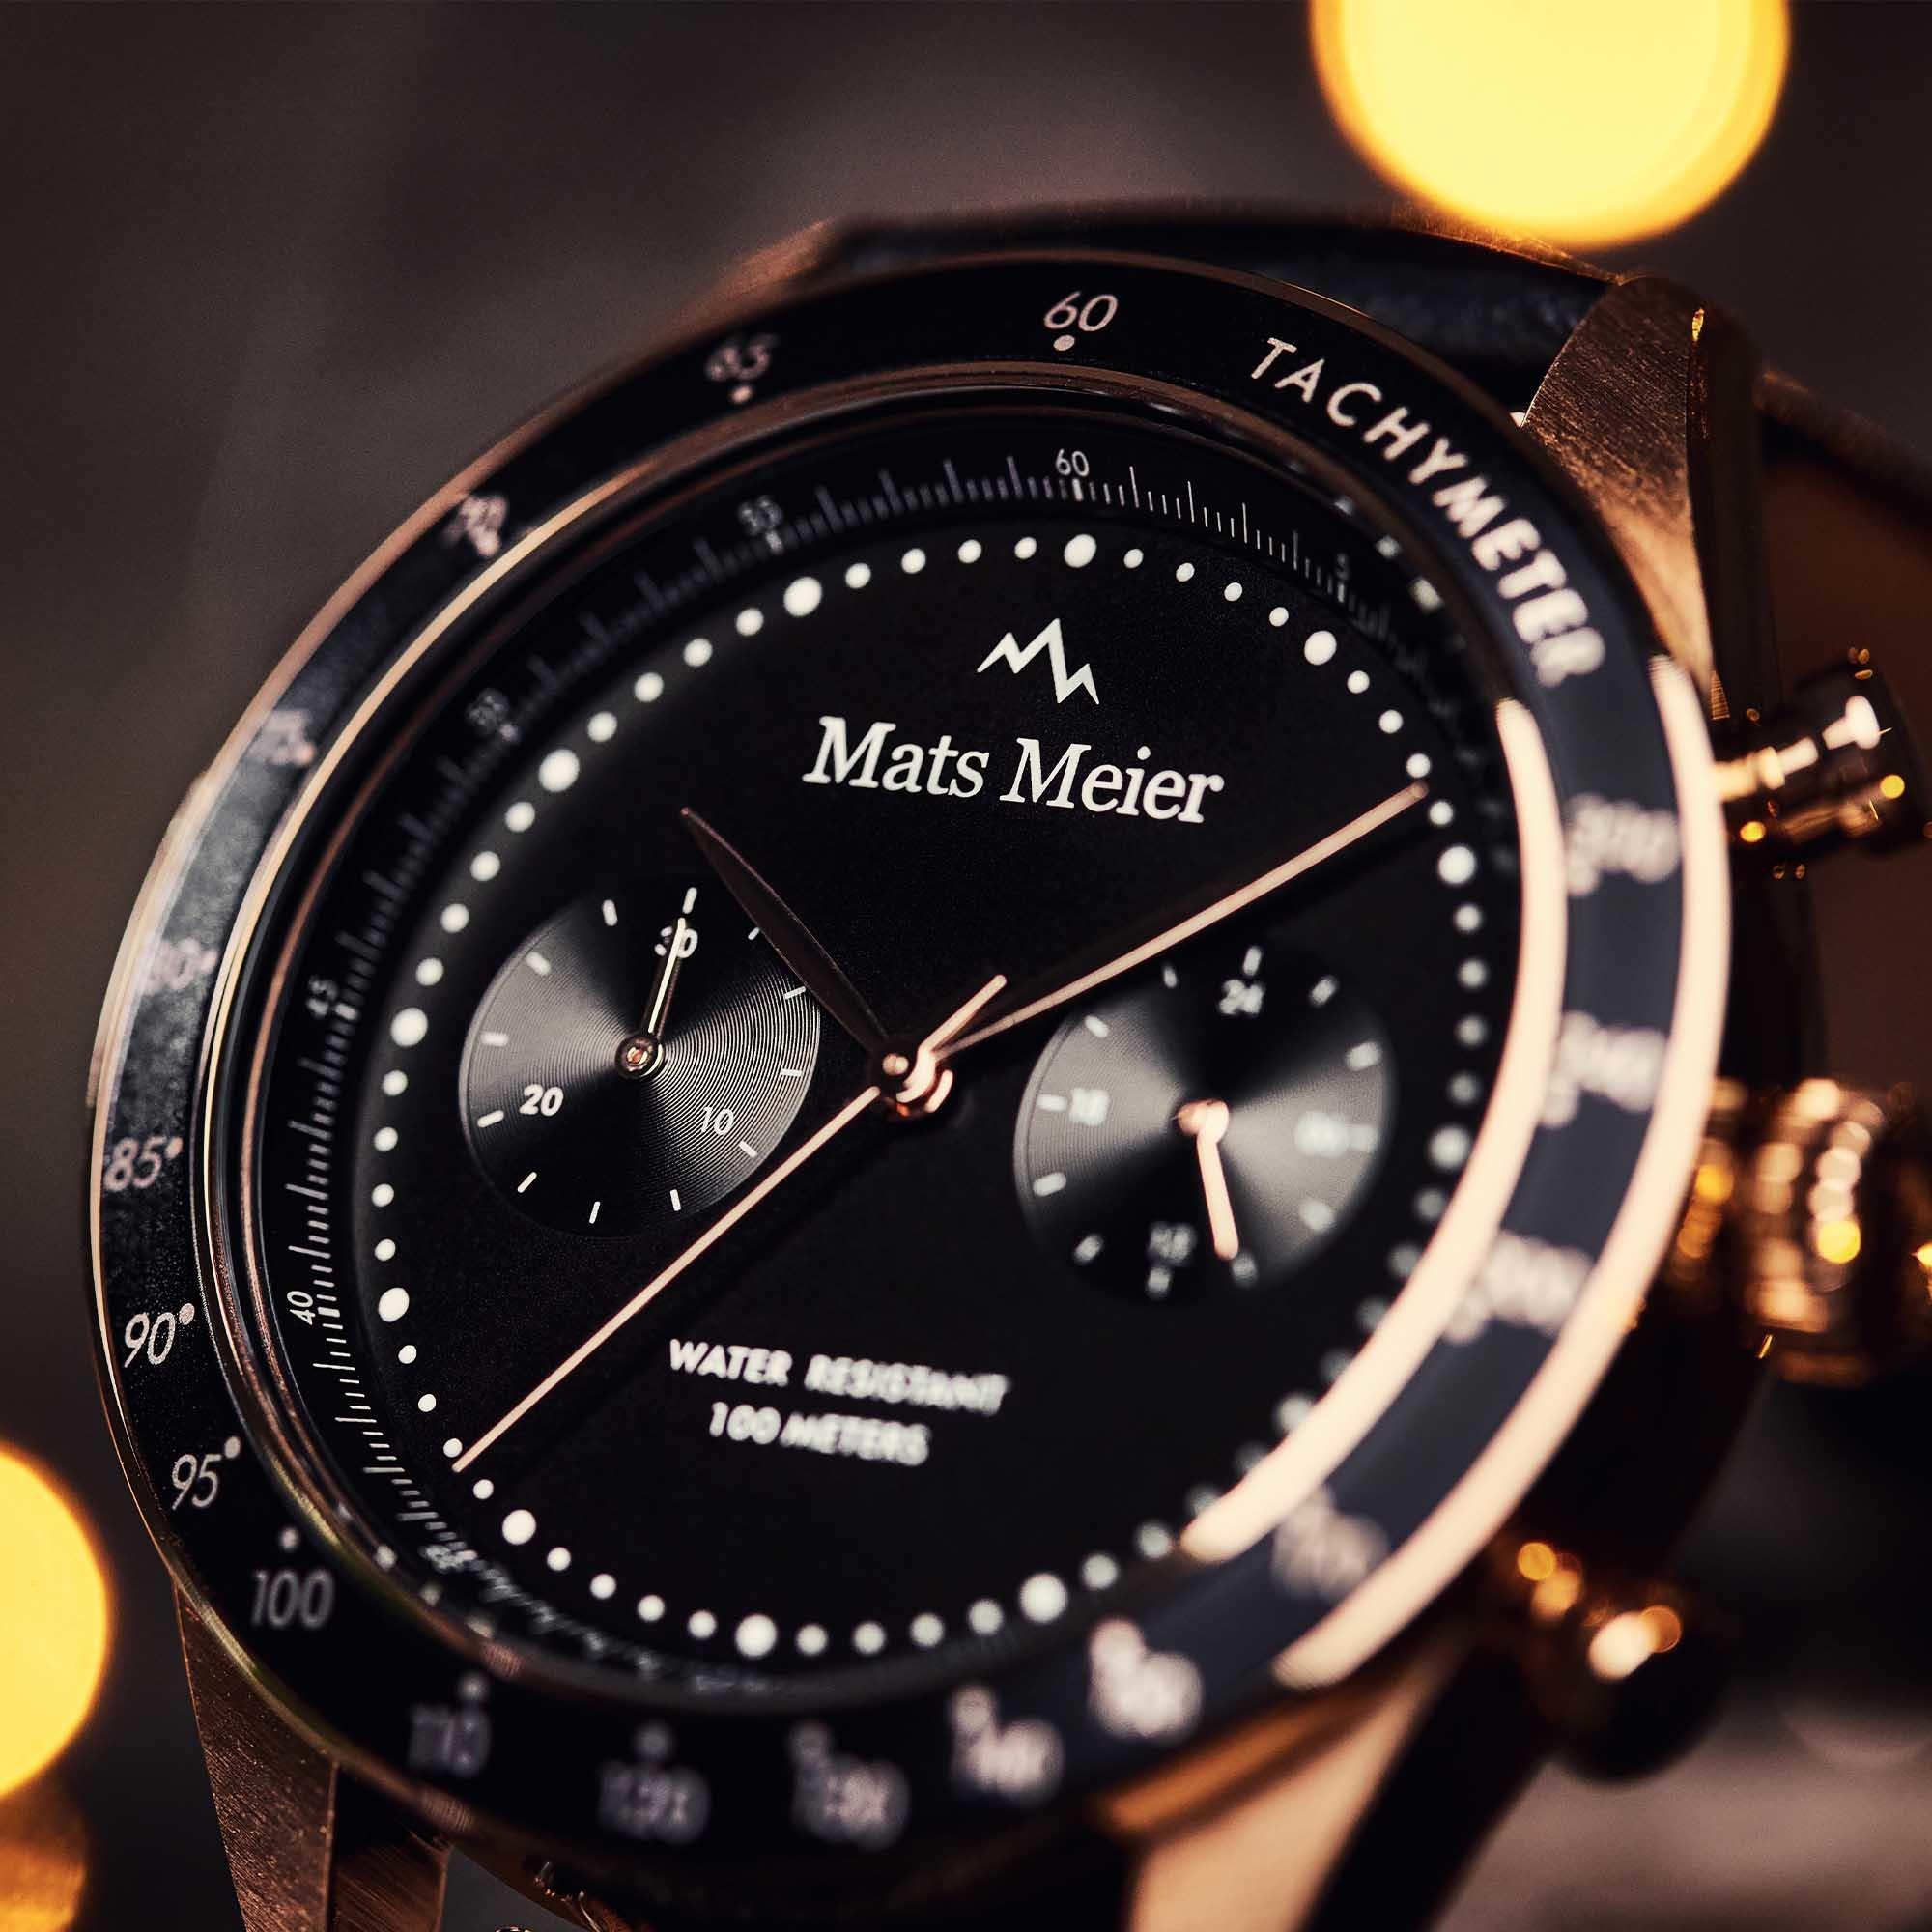 Mats Meier Arosa Racing Chronograaf herenhorloge zwart en rosé goudkleurig